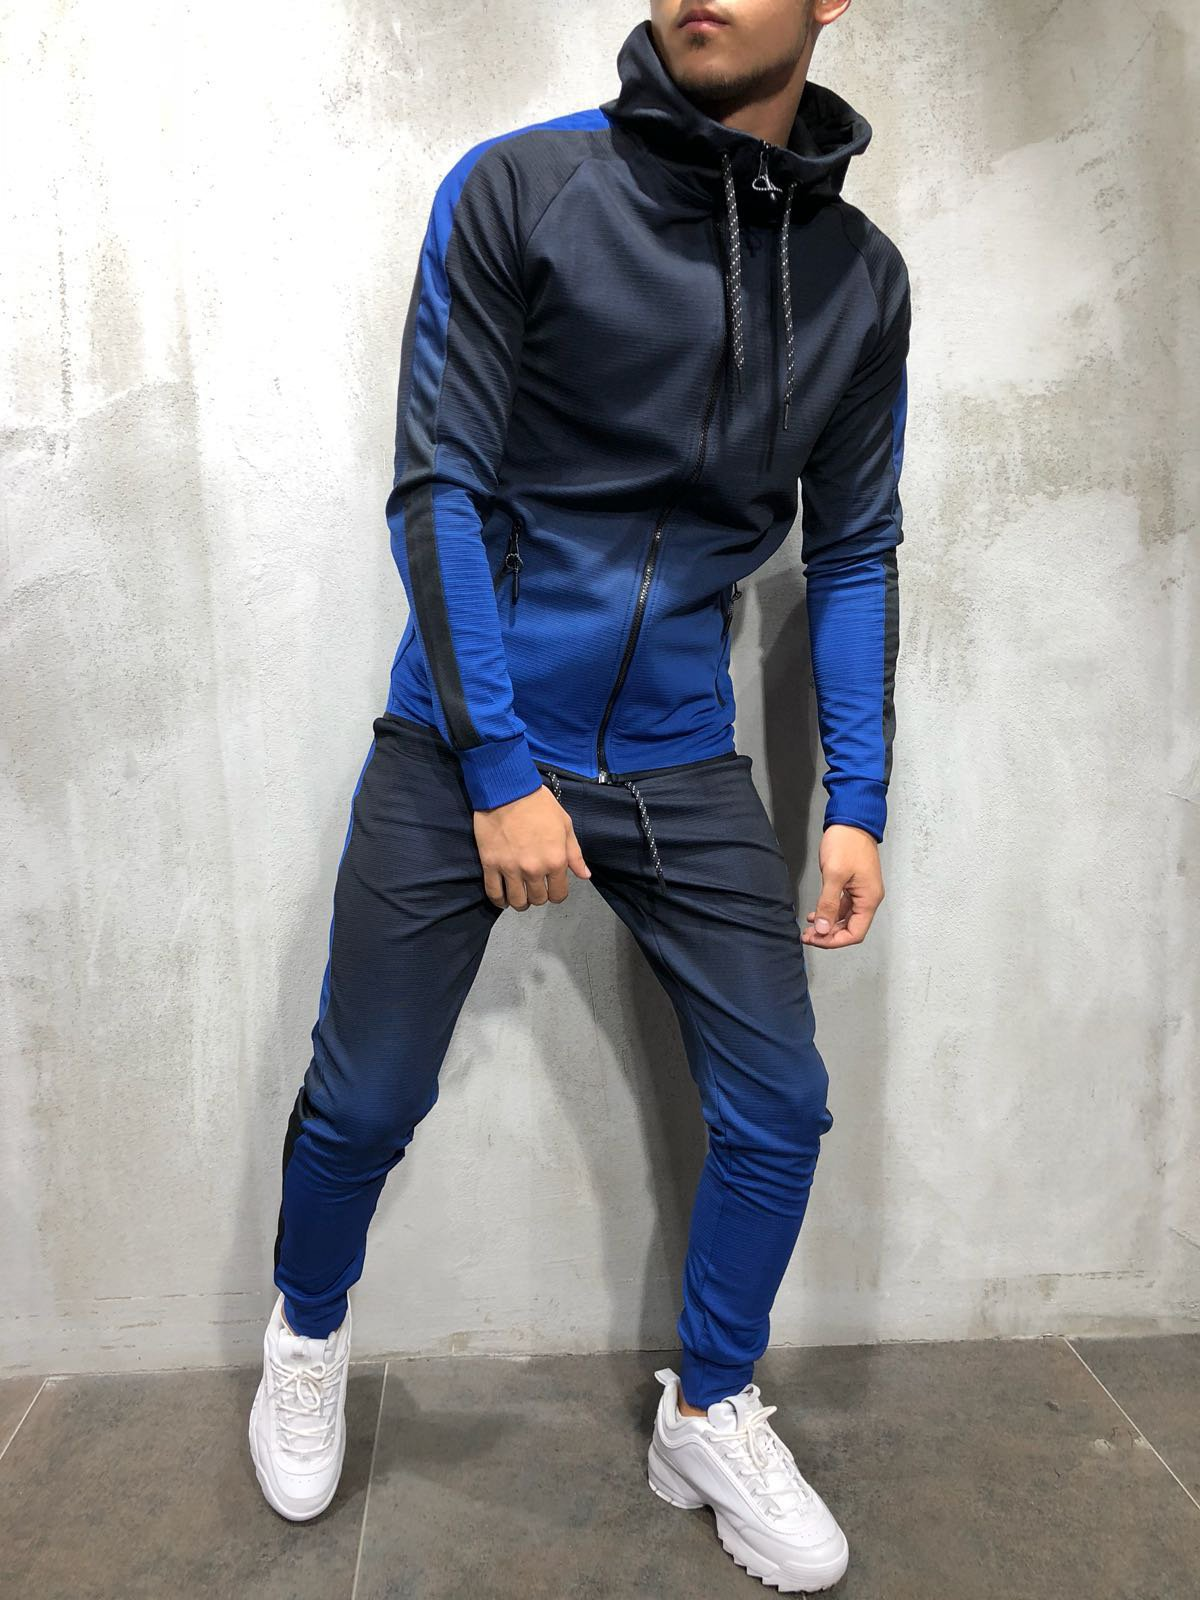 product-Men Wholesale Gym Fitness Wear 2 Piece Tracksuit Sport Jogging Set-Ruiteng-img